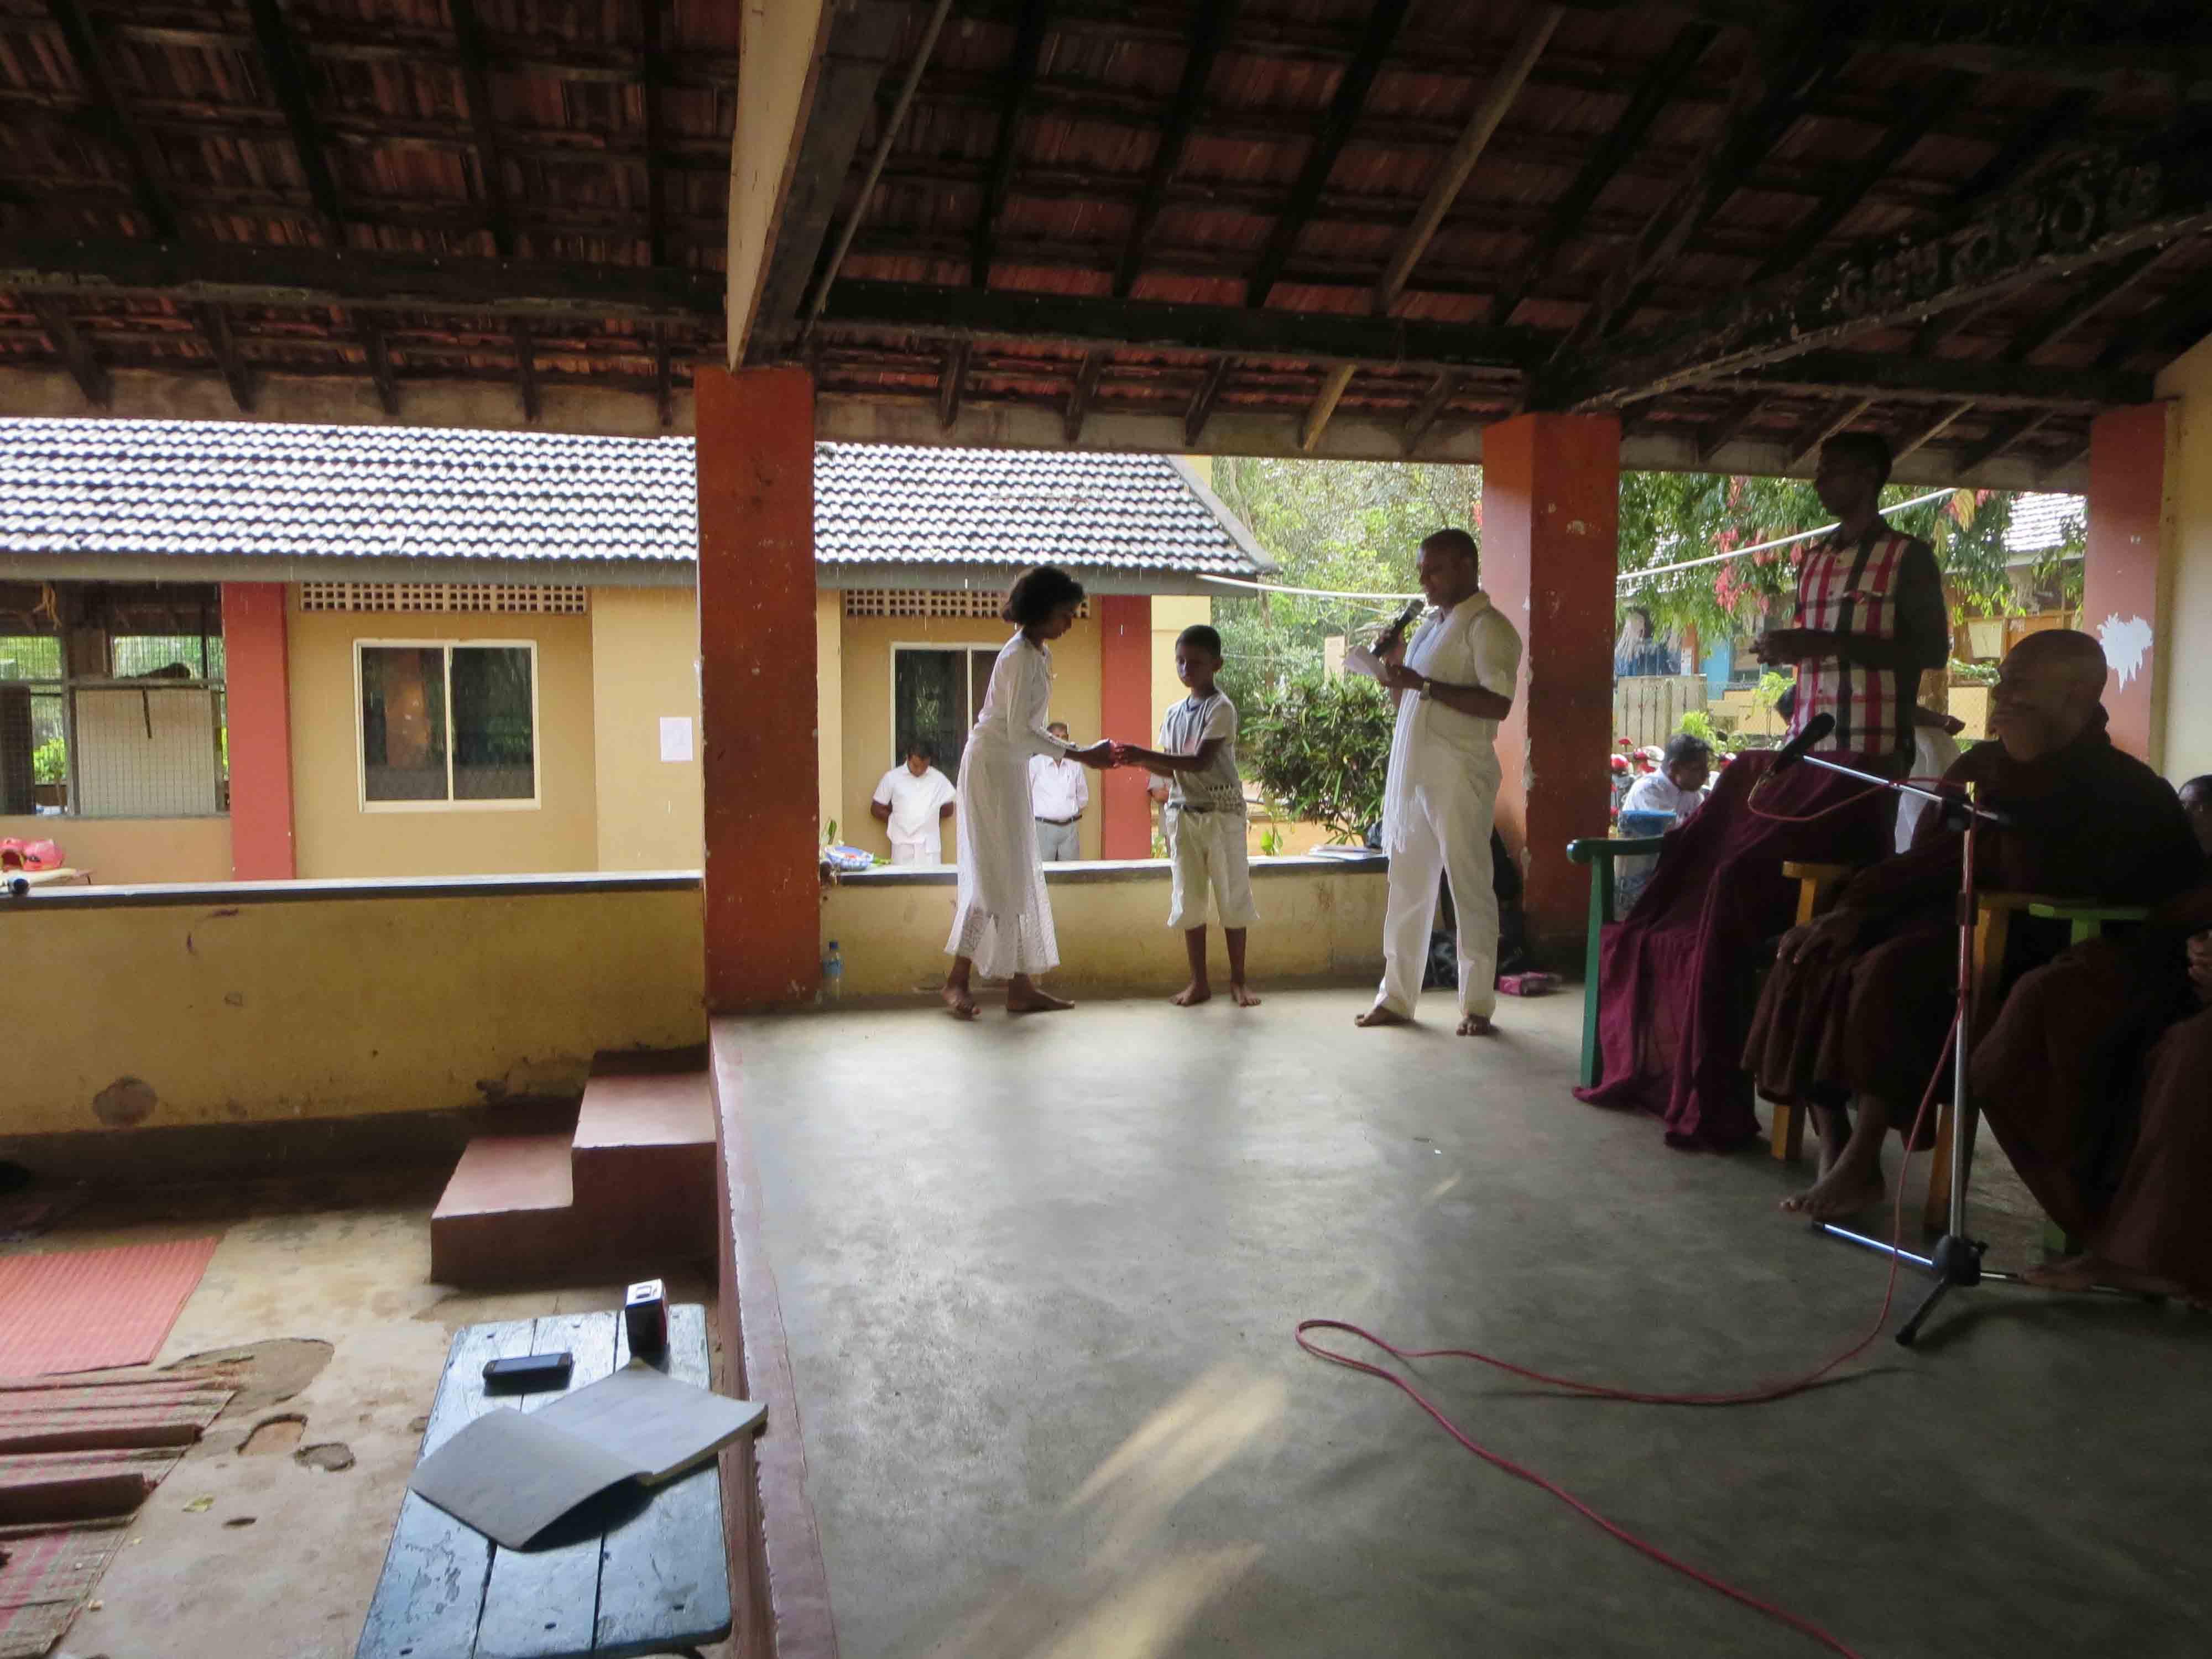 Sati Pasala Mindfulness Camp at Meethirigala Kanishta Vidyalaya